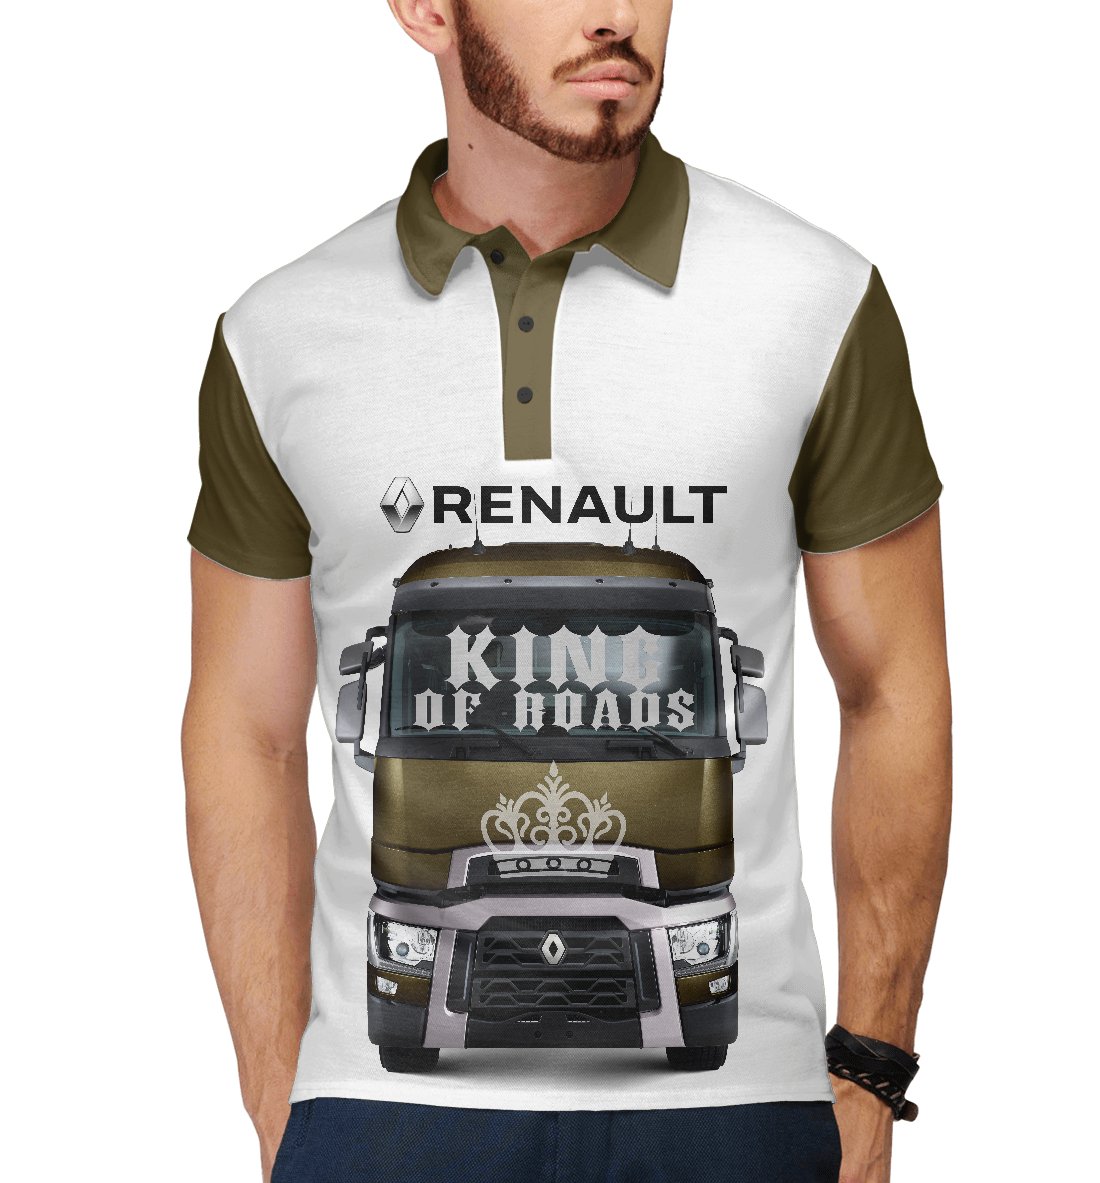 Купить RENAULT - король дорог, Printbar, Поло, GRZ-918078-pol-2